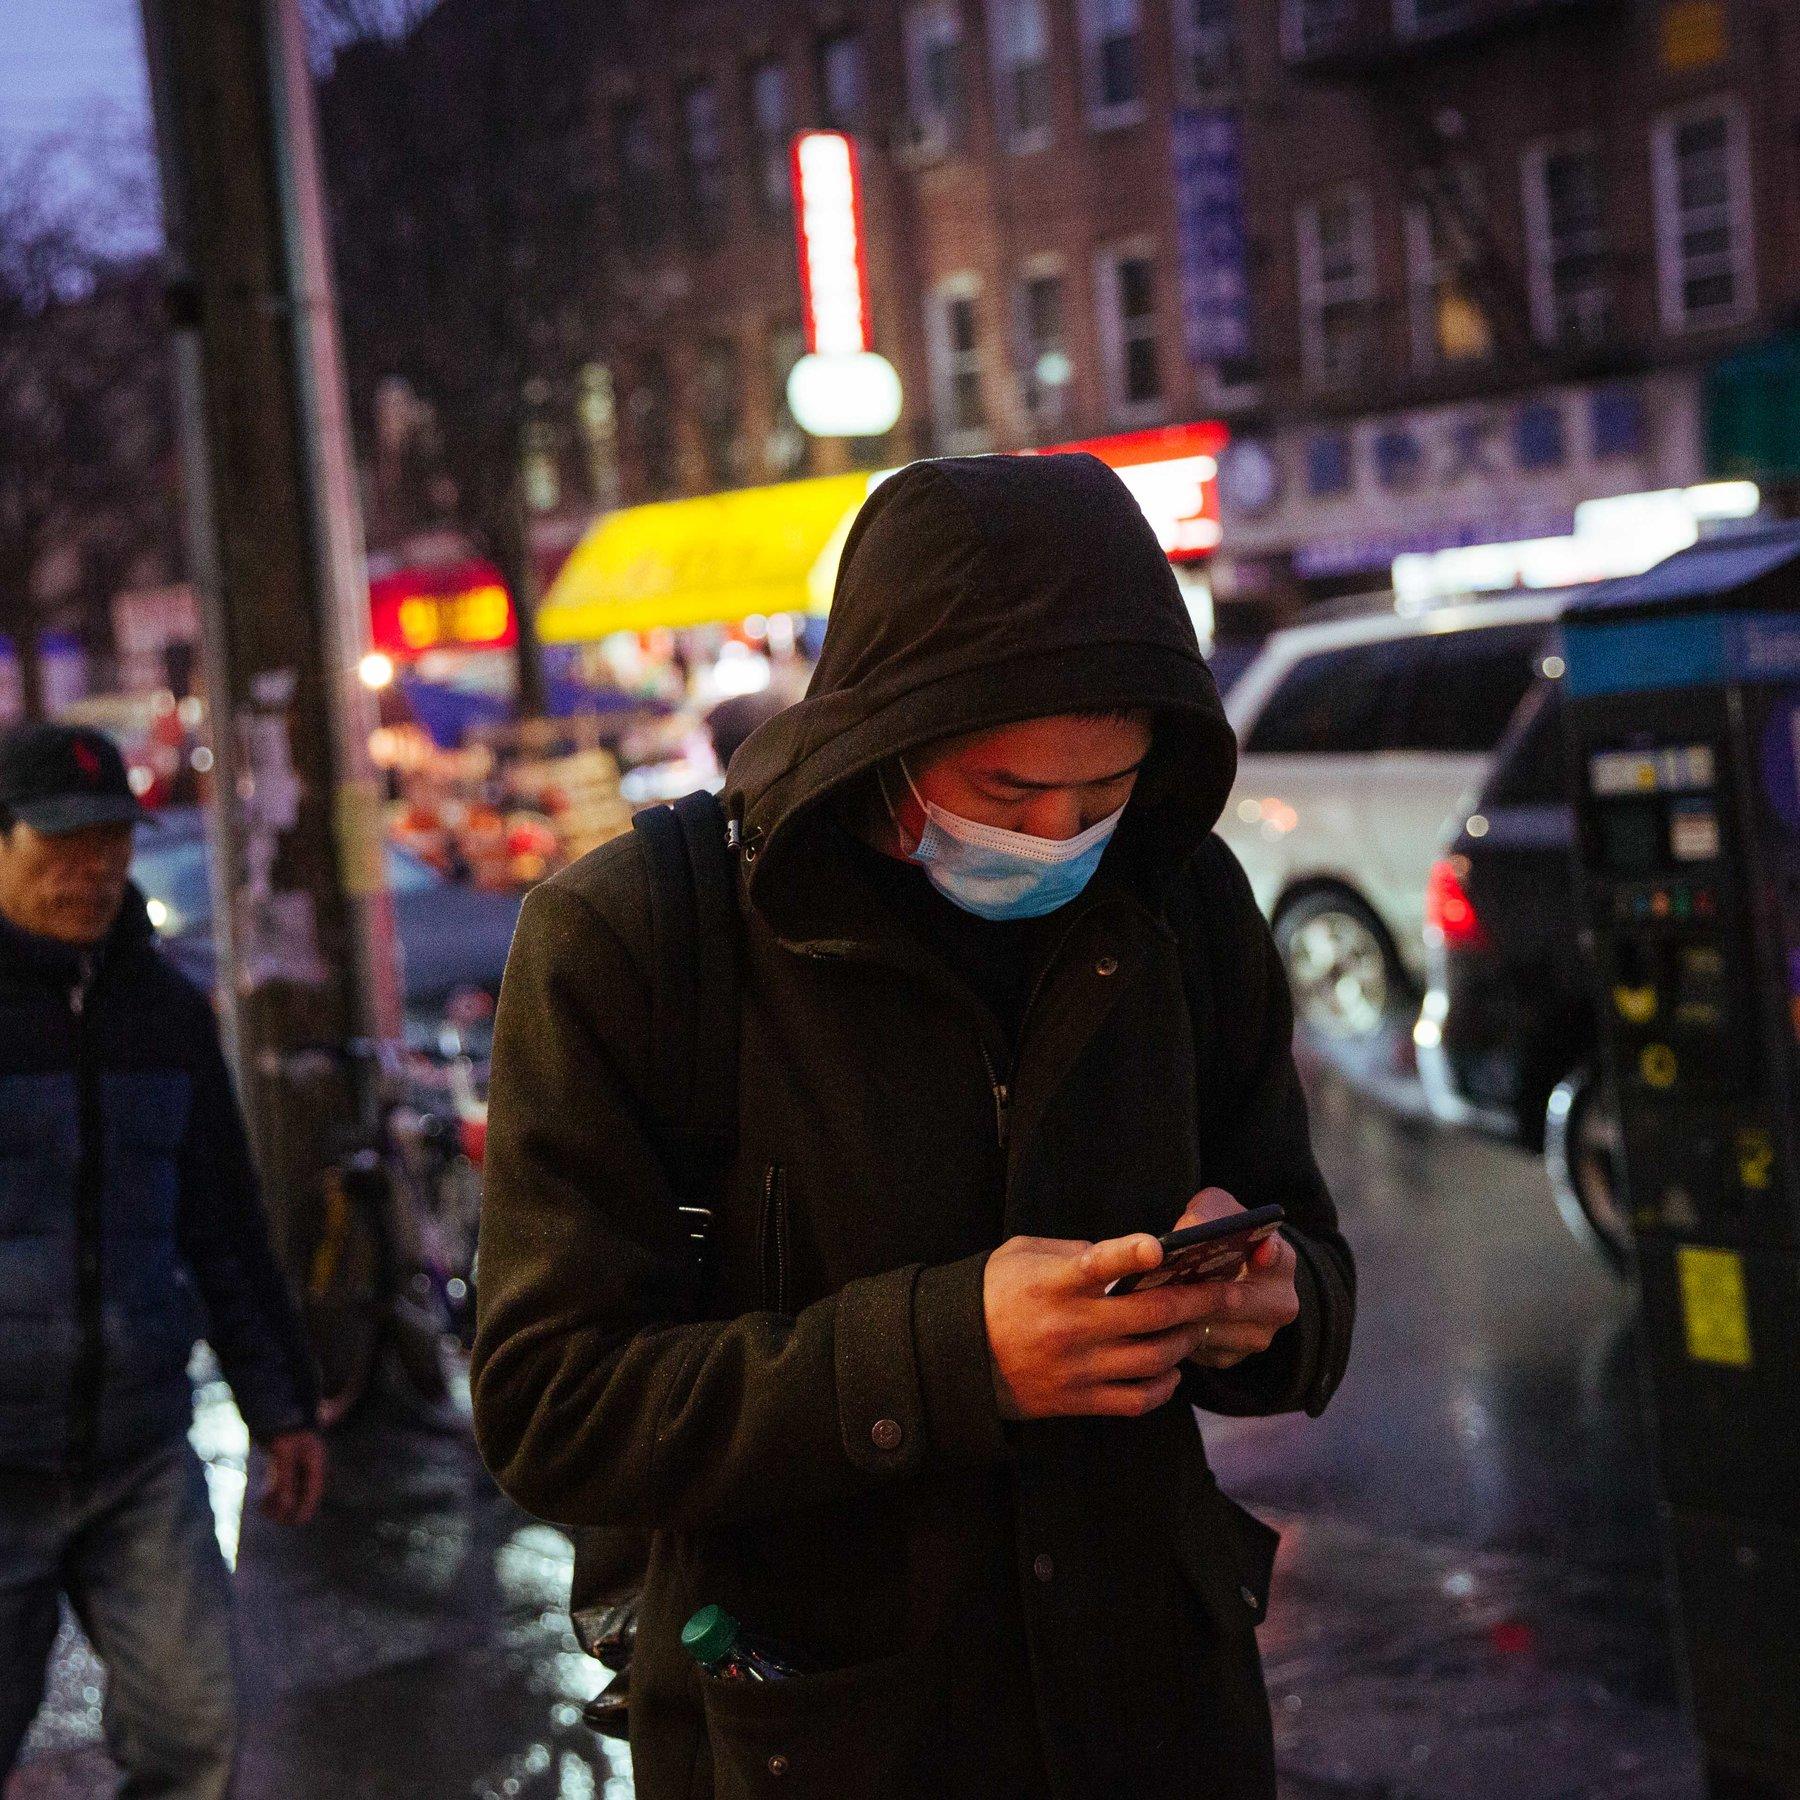 Coronavirus in New York: the Latest - The New York Times